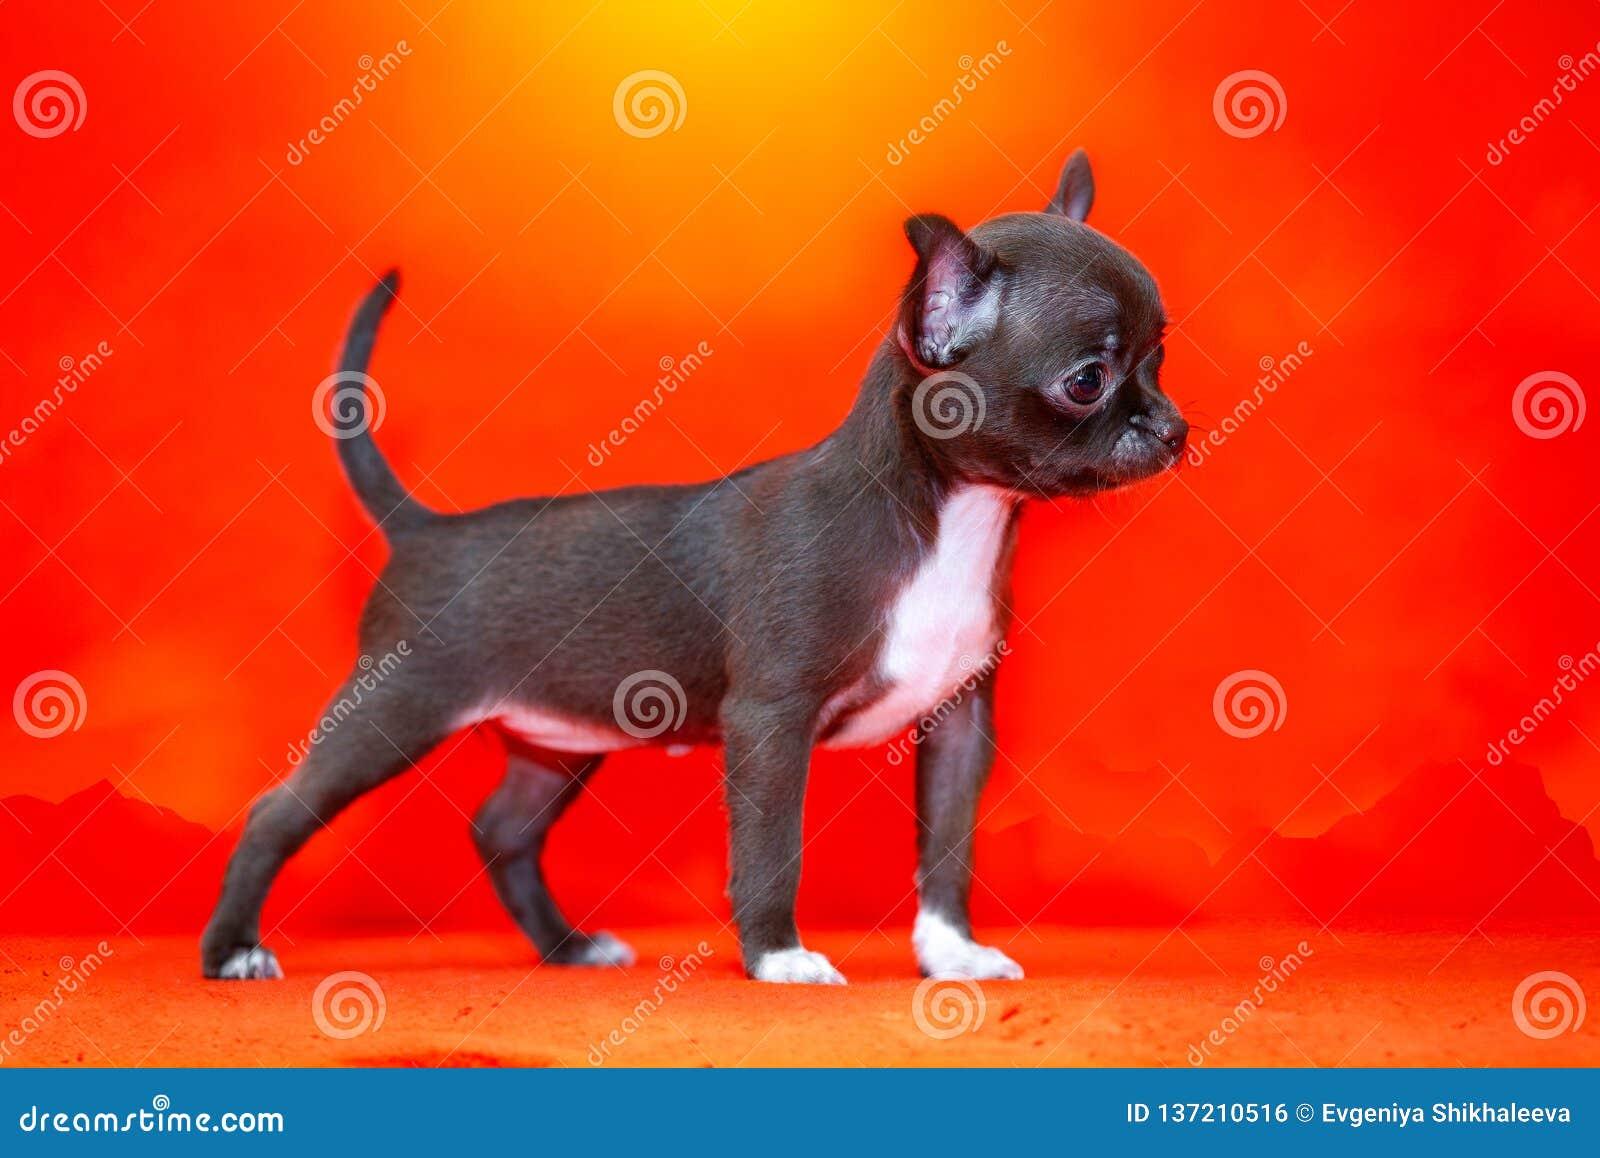 цвета Шоколад щенок чихуахуа на пляже красивейший заход солнца